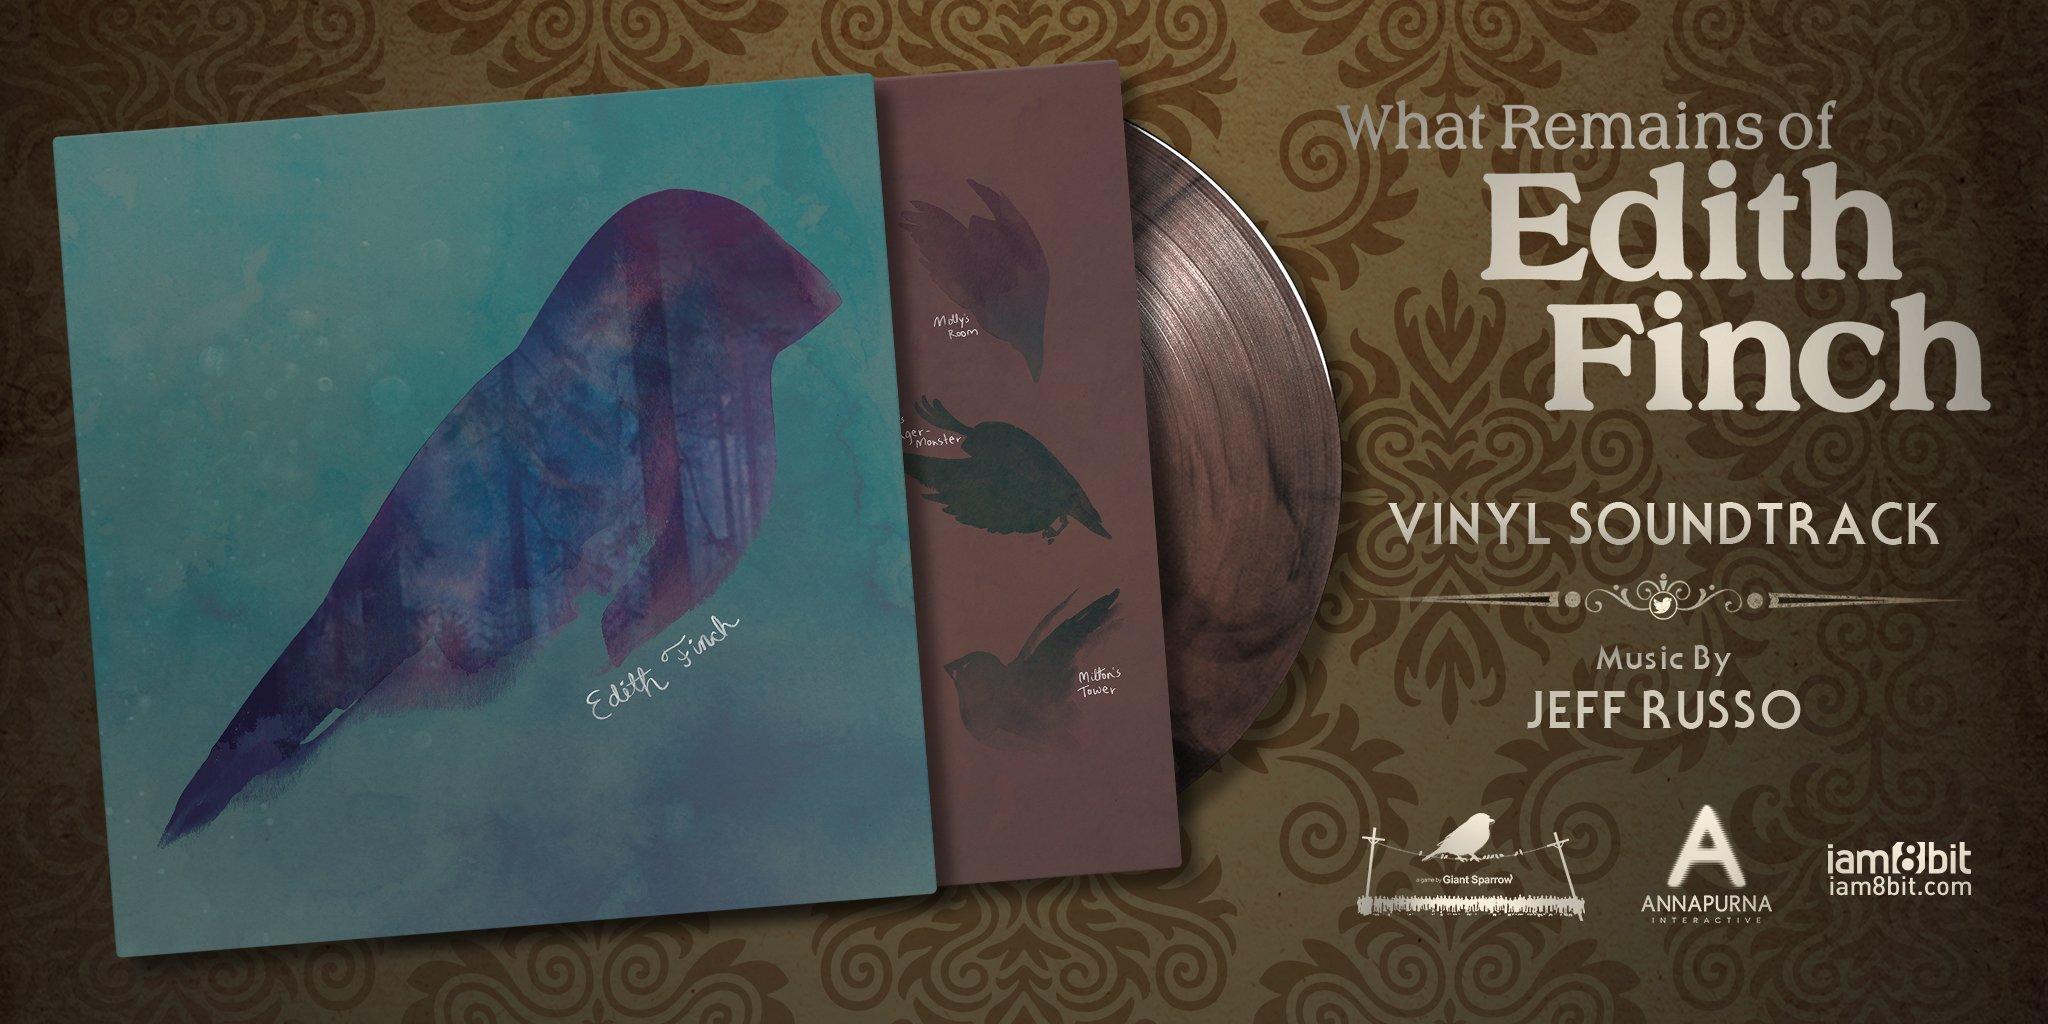 What Remains of Edith Finch Collection / フィンチ家の奇妙な屋敷でおきたこと オリジナルゲームサウンドトラック アナログレコード - 画像4